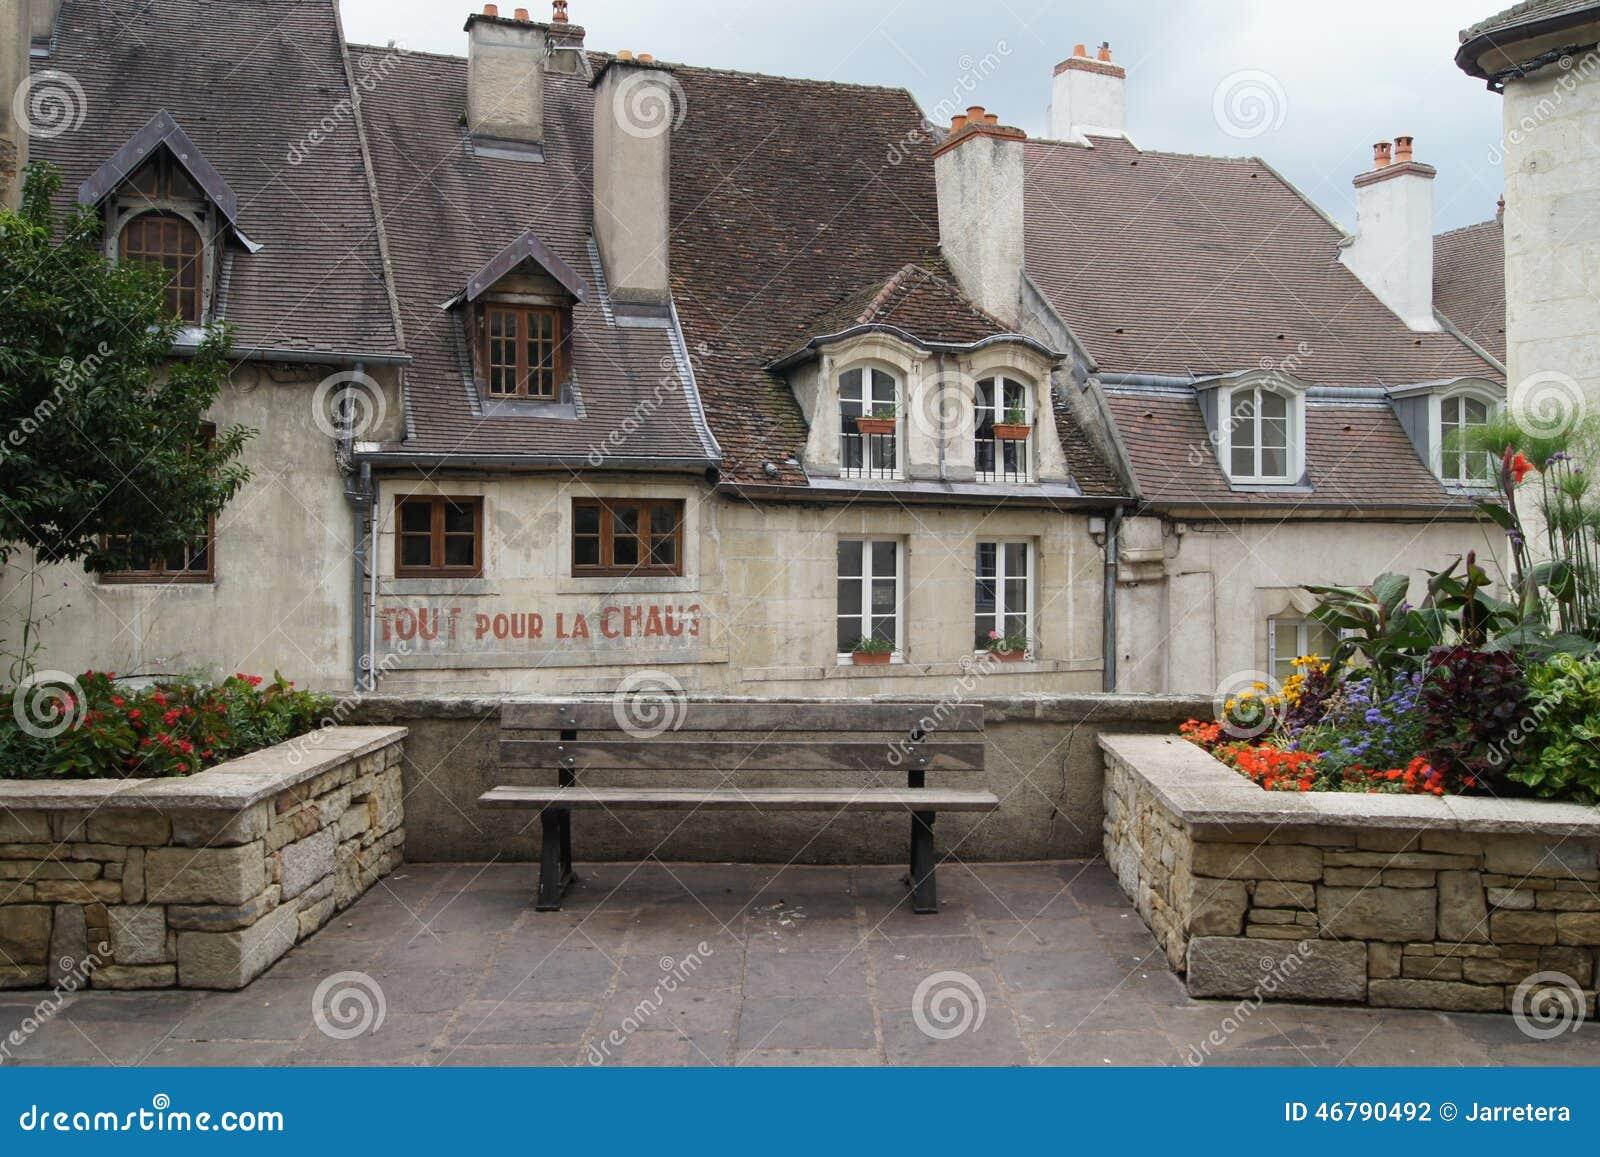 fransk stad